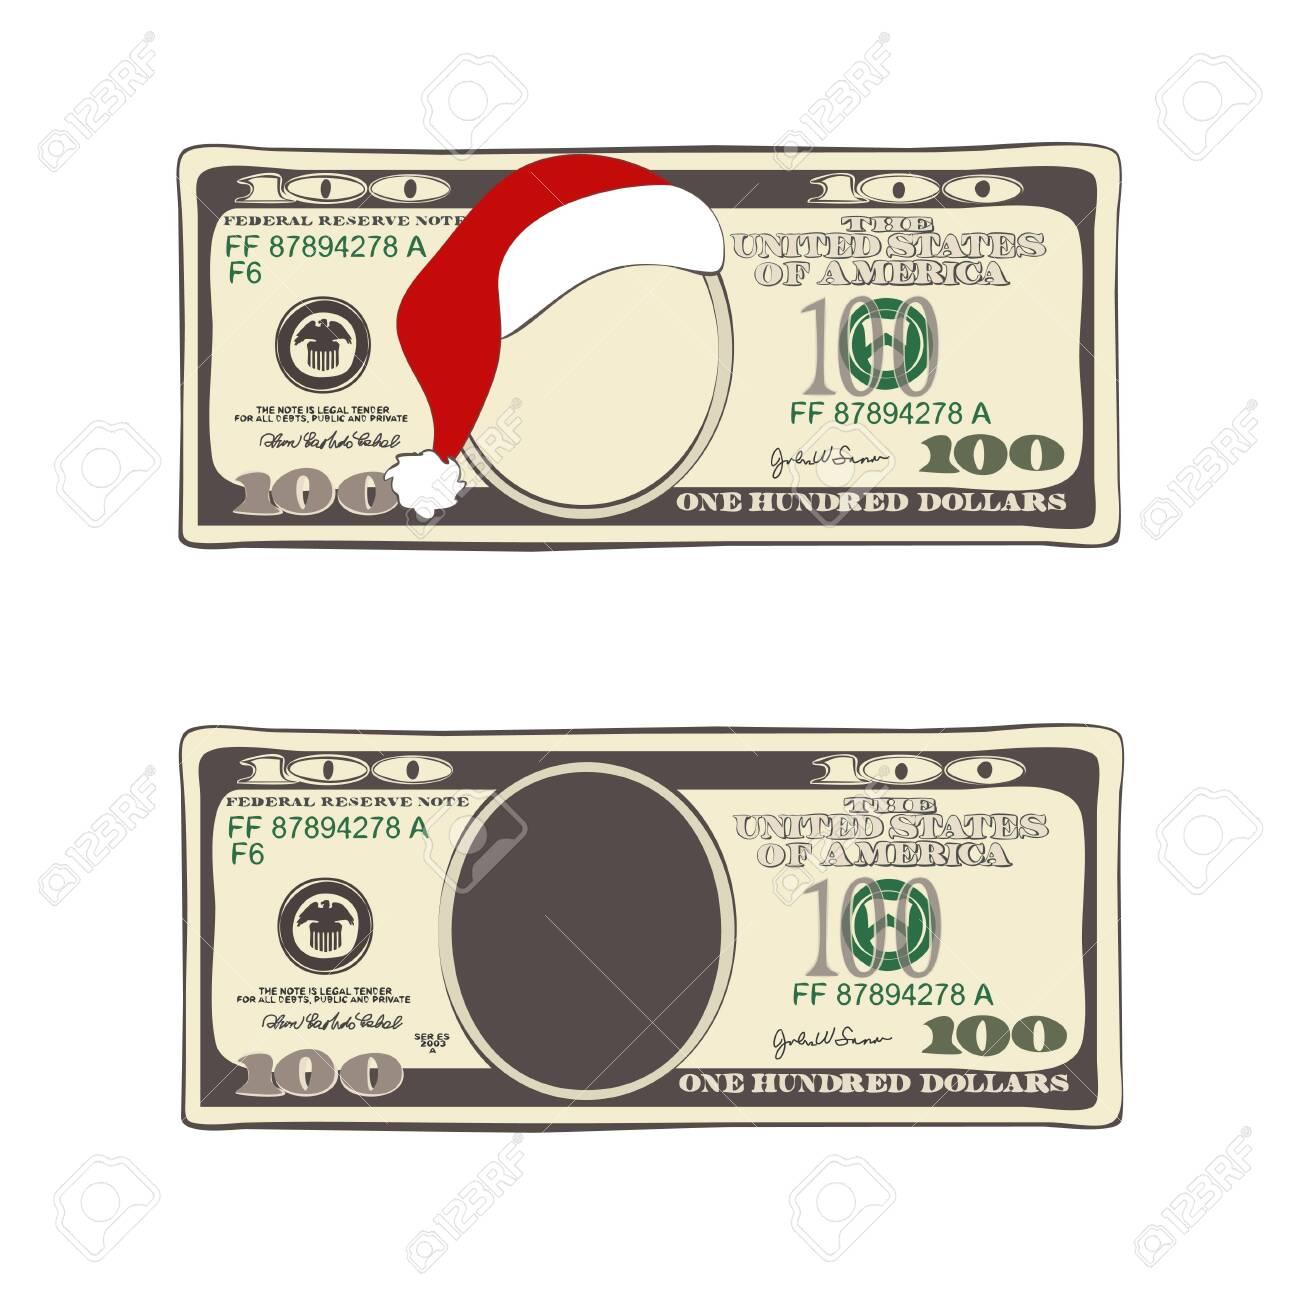 Design of 100 dollars with Santa Claus hat. - 140706597